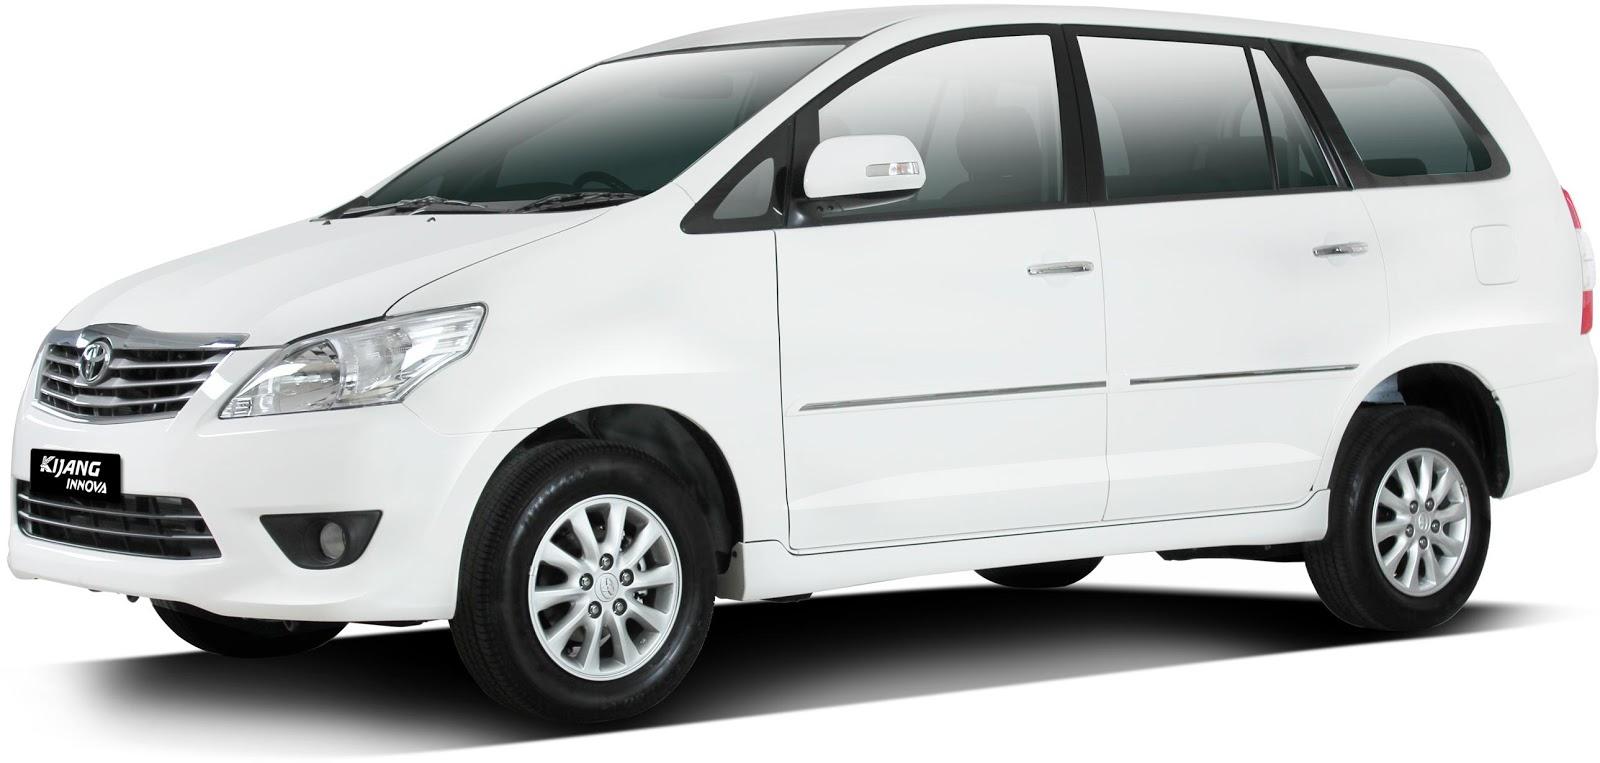 Grand New Kijang Innova Veloz 1.5 Modifikasi 2011 Dikta Toyota Informasi Produk Dan